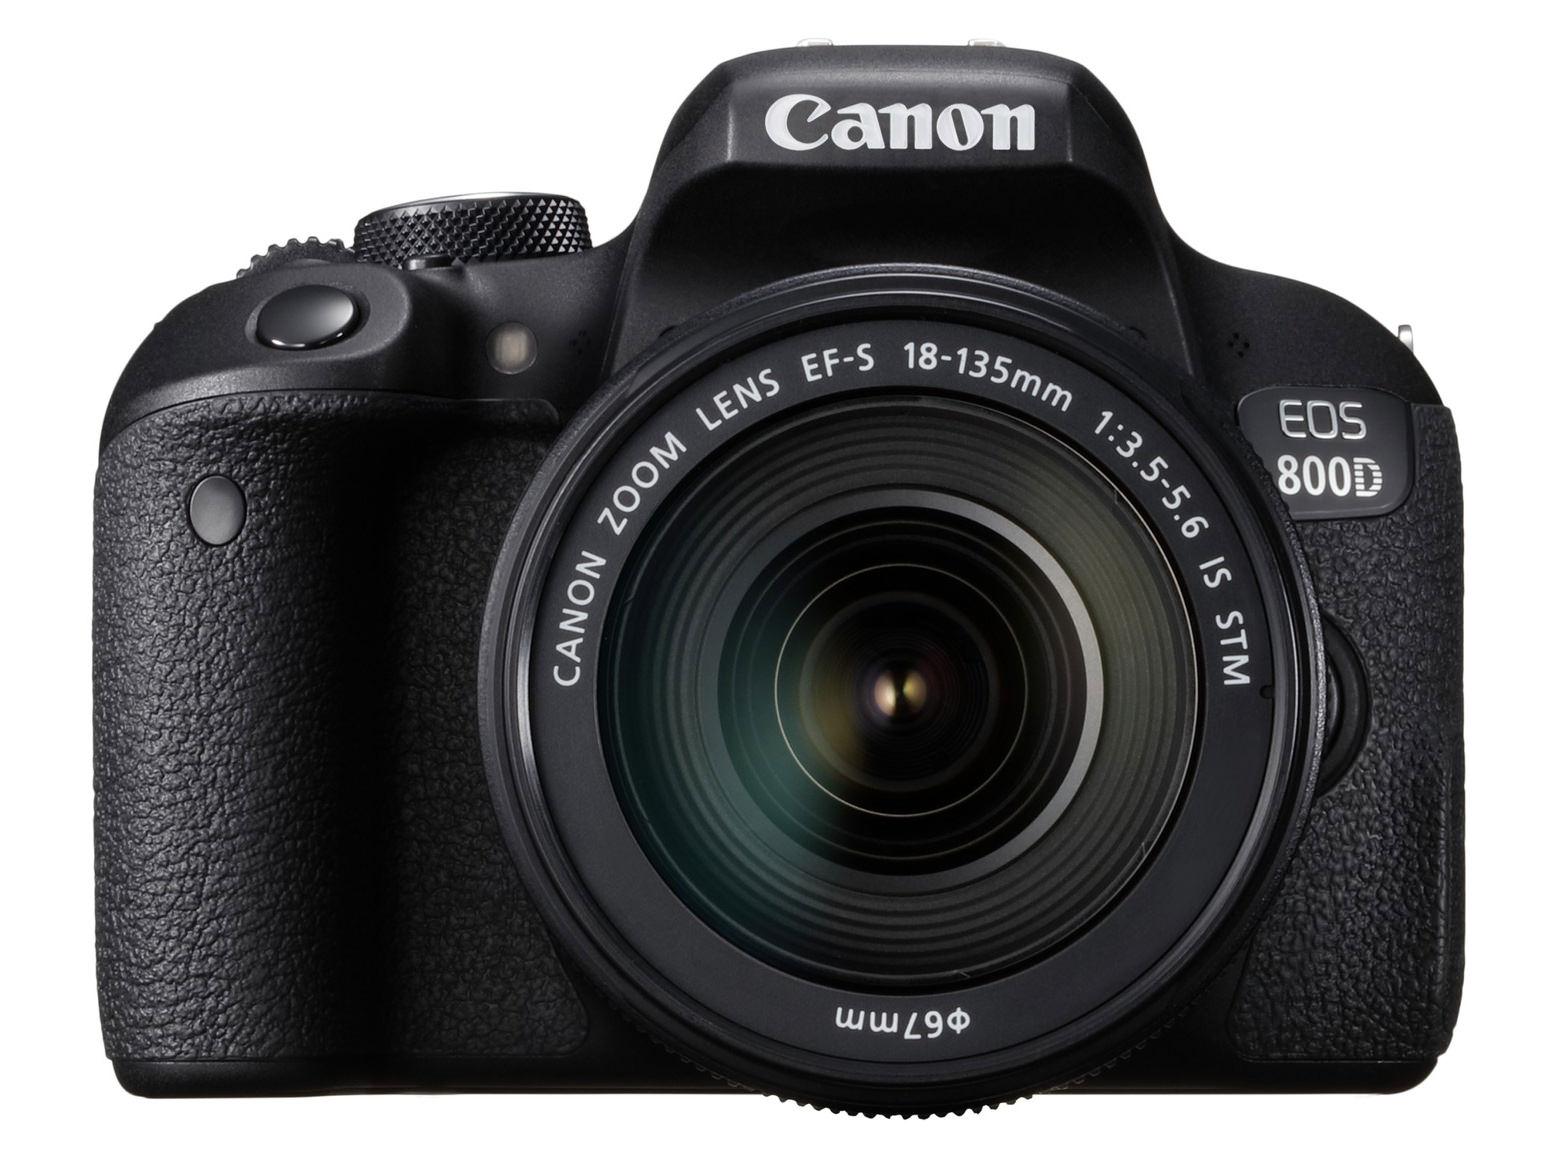 Canon announces two new DSLRs - EOS 77D and EOS 800D